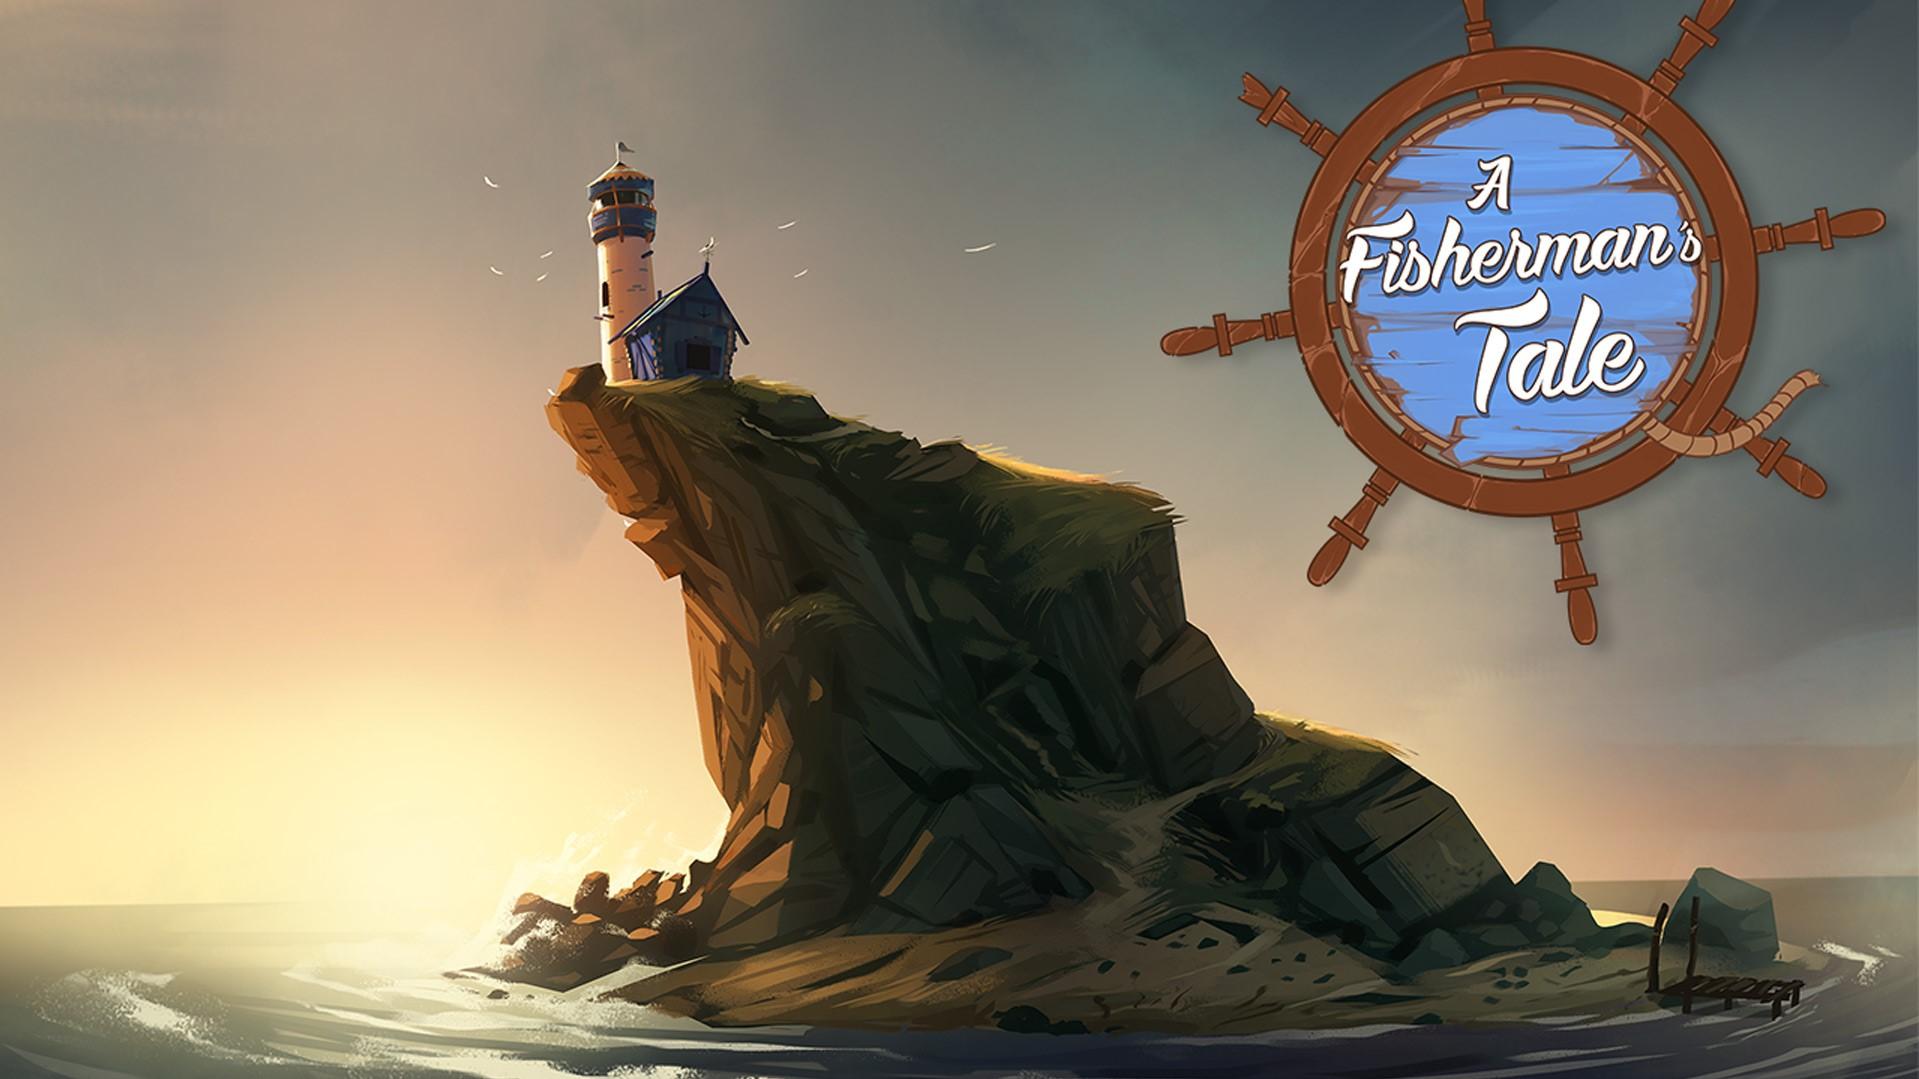 a fishermans tale video game hd wallpaper 68080